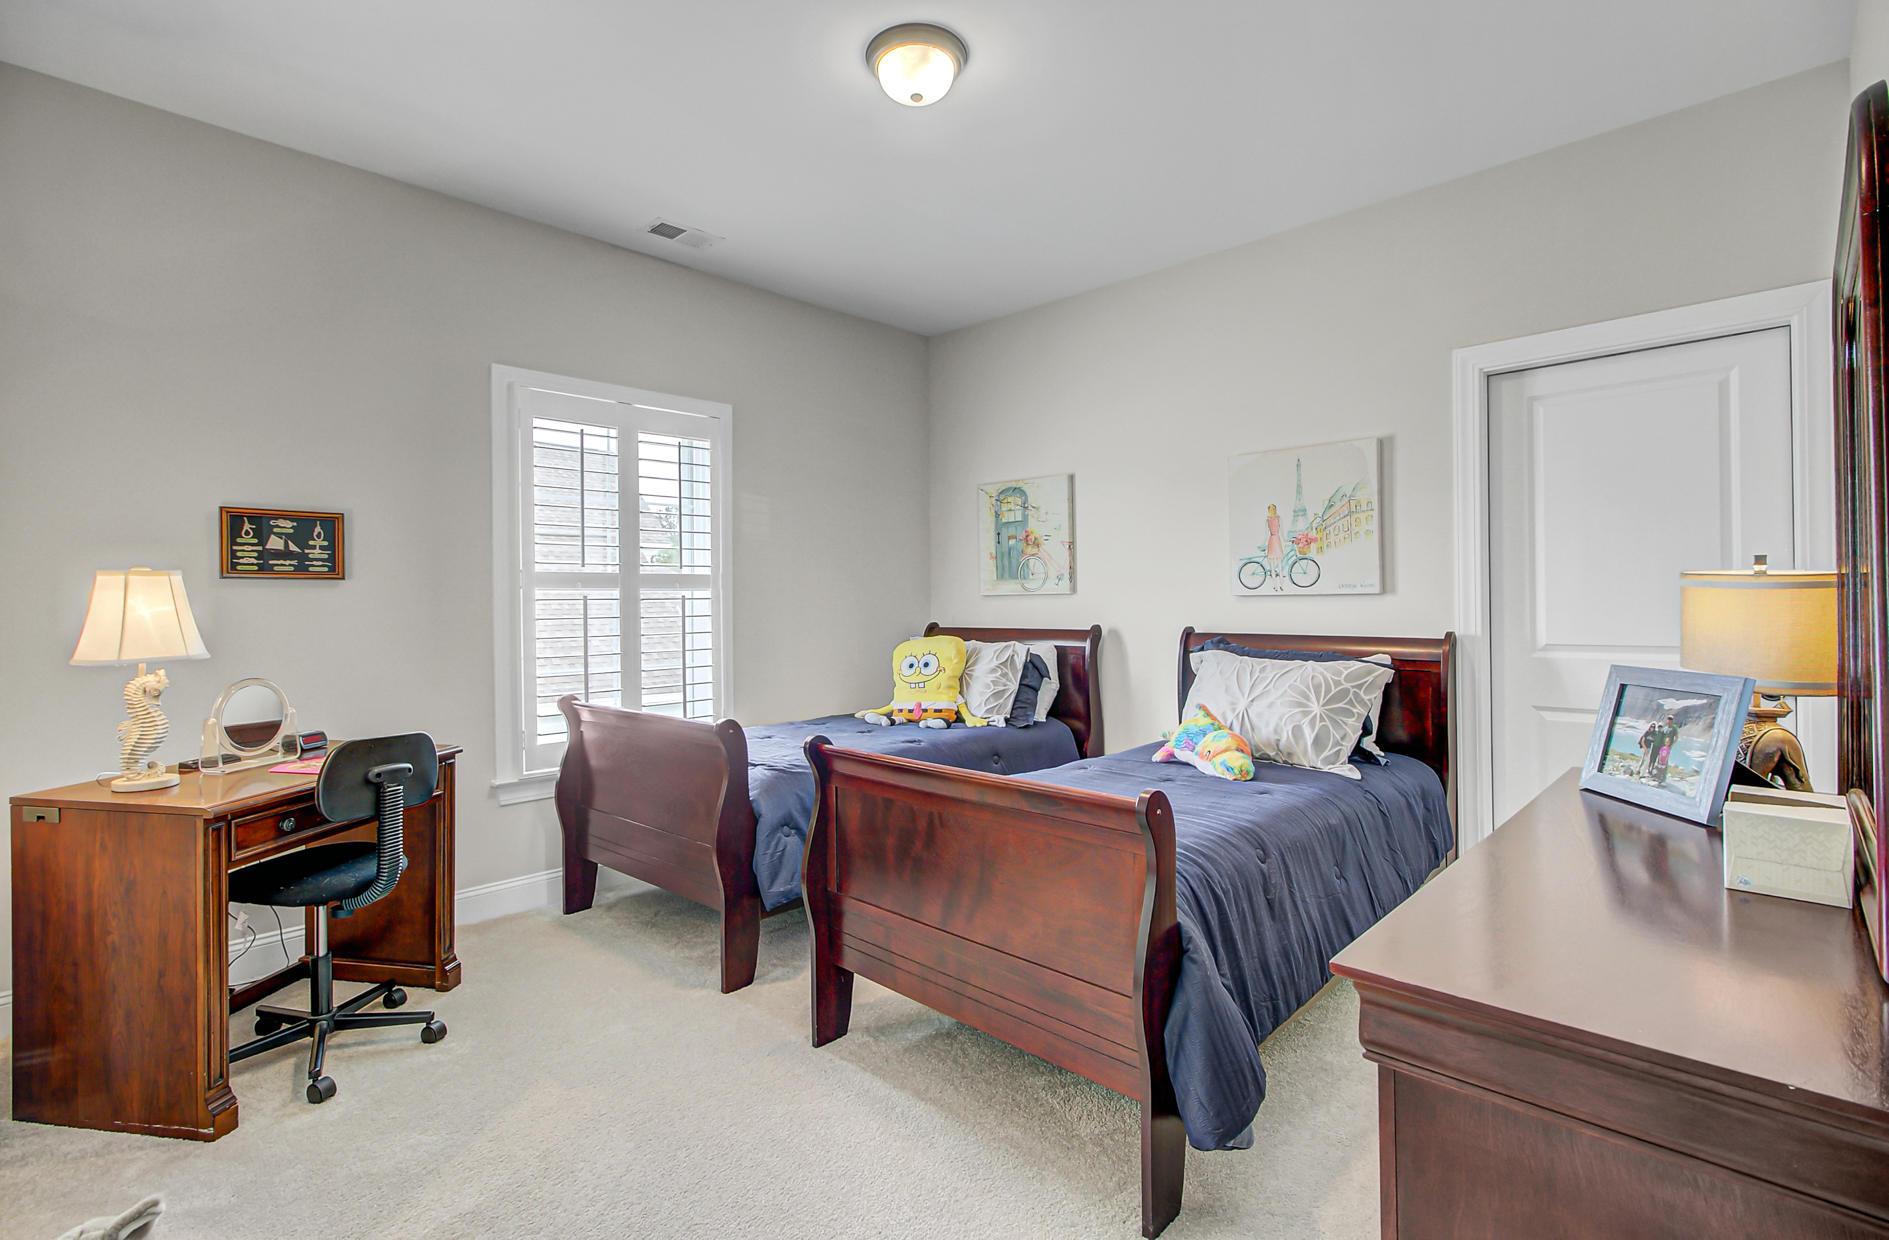 Park West Homes For Sale - 2824 Wagner, Mount Pleasant, SC - 34